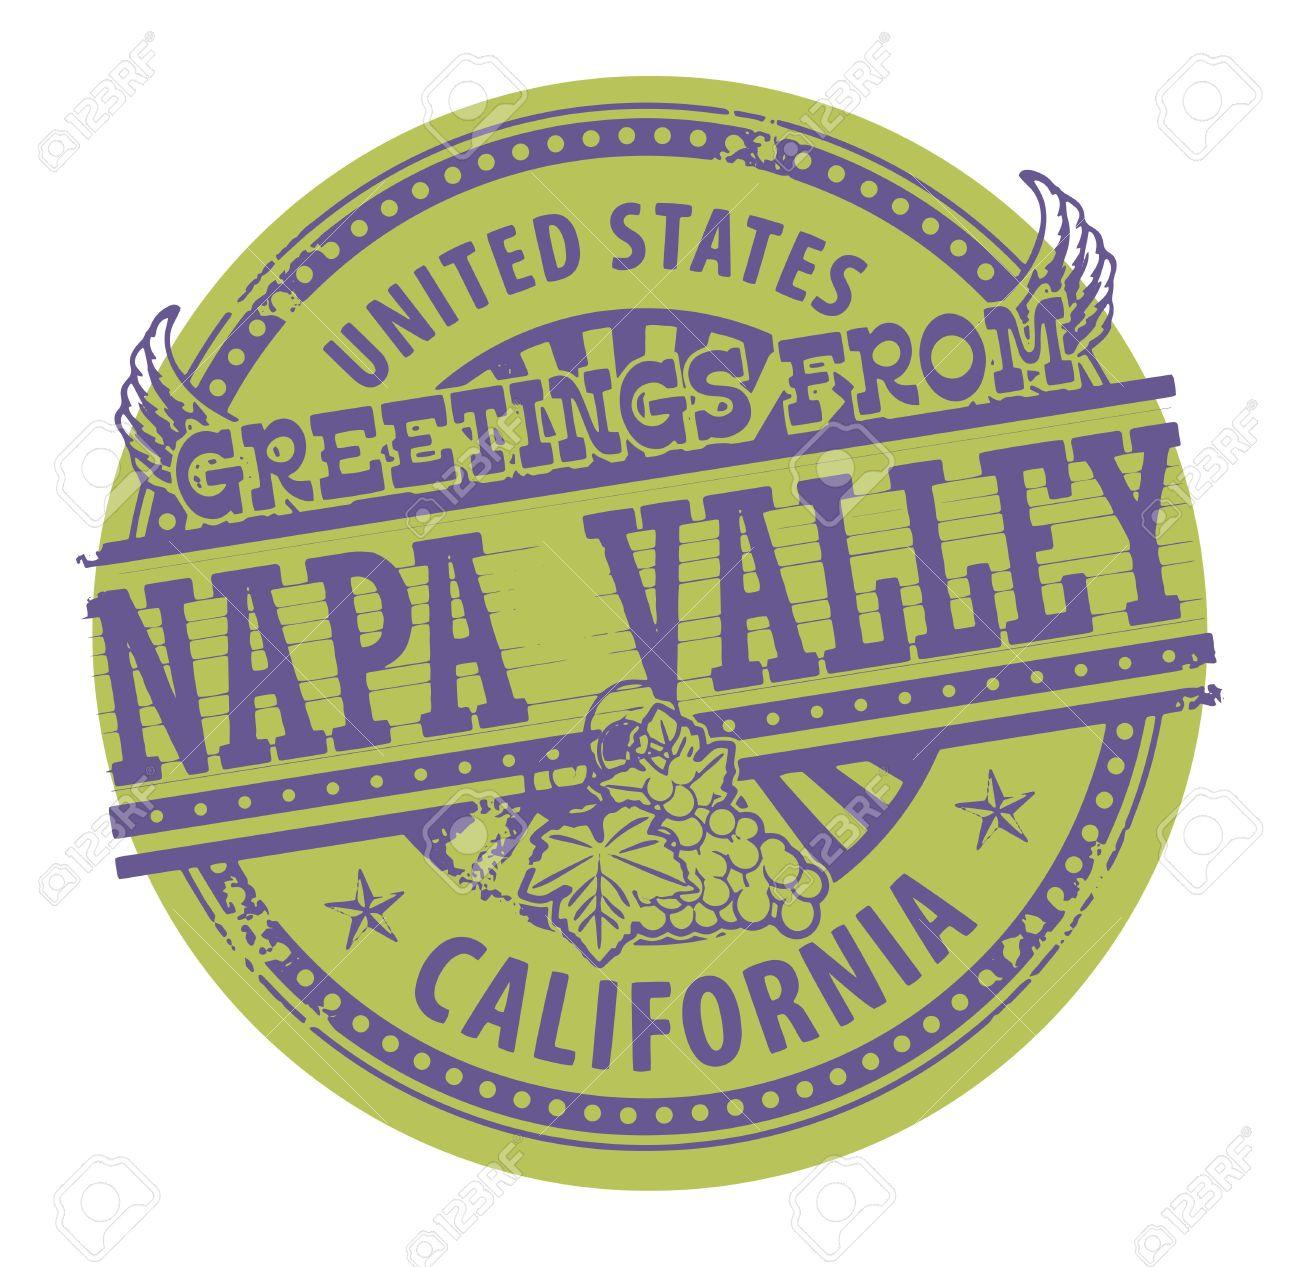 Free napa valley clip art.